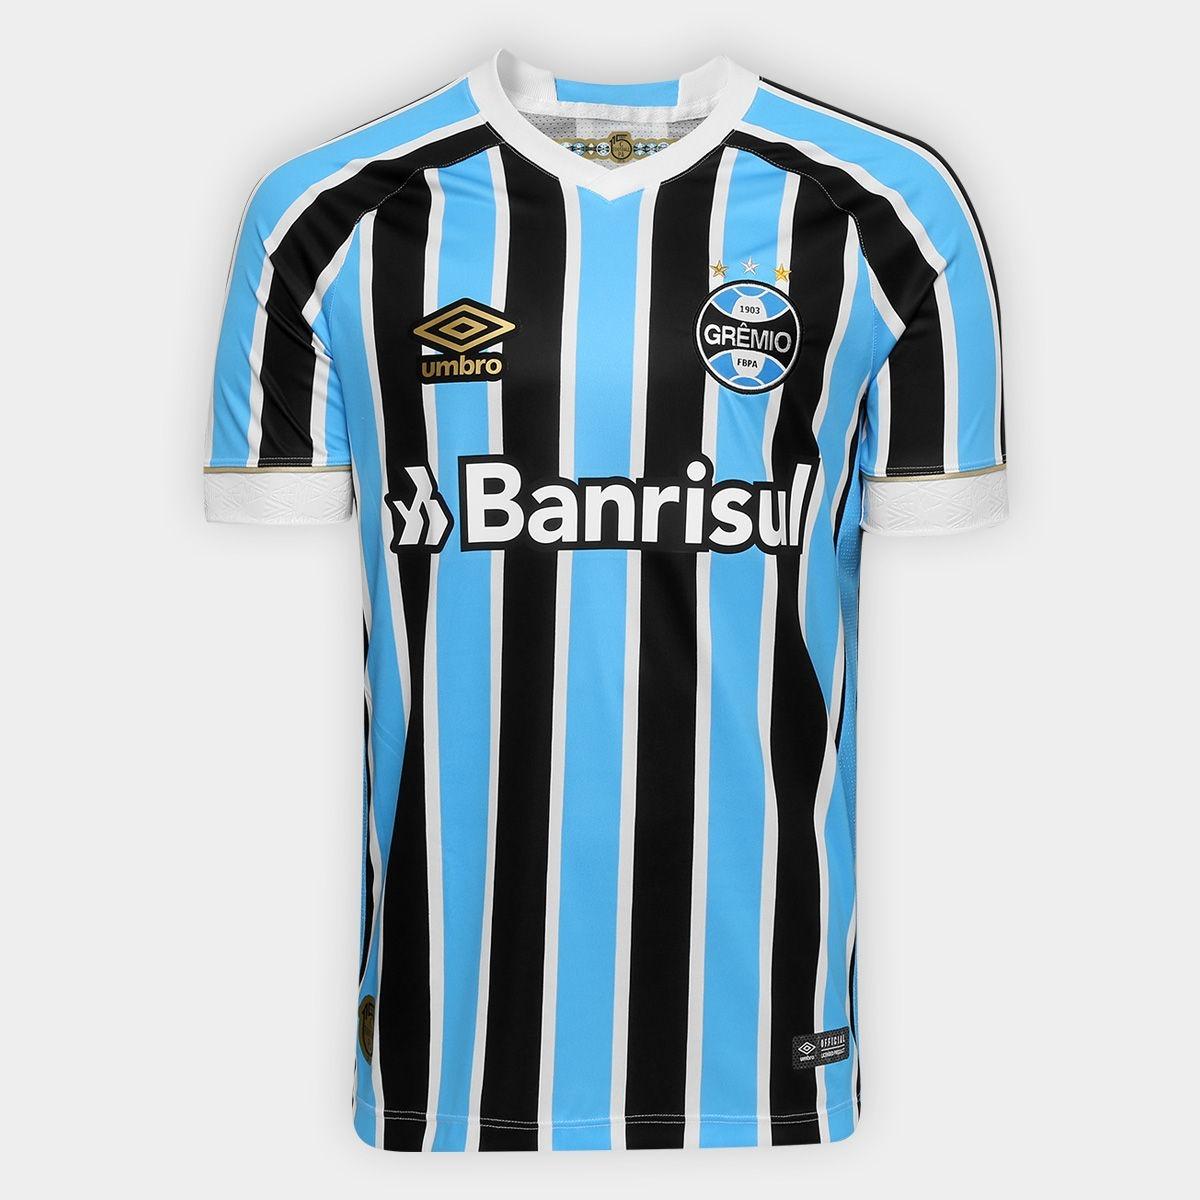 camisa masculina oficial 1 grêmio 2018 torcedor umbro fan. Carregando zoom. efaf108ccedeb